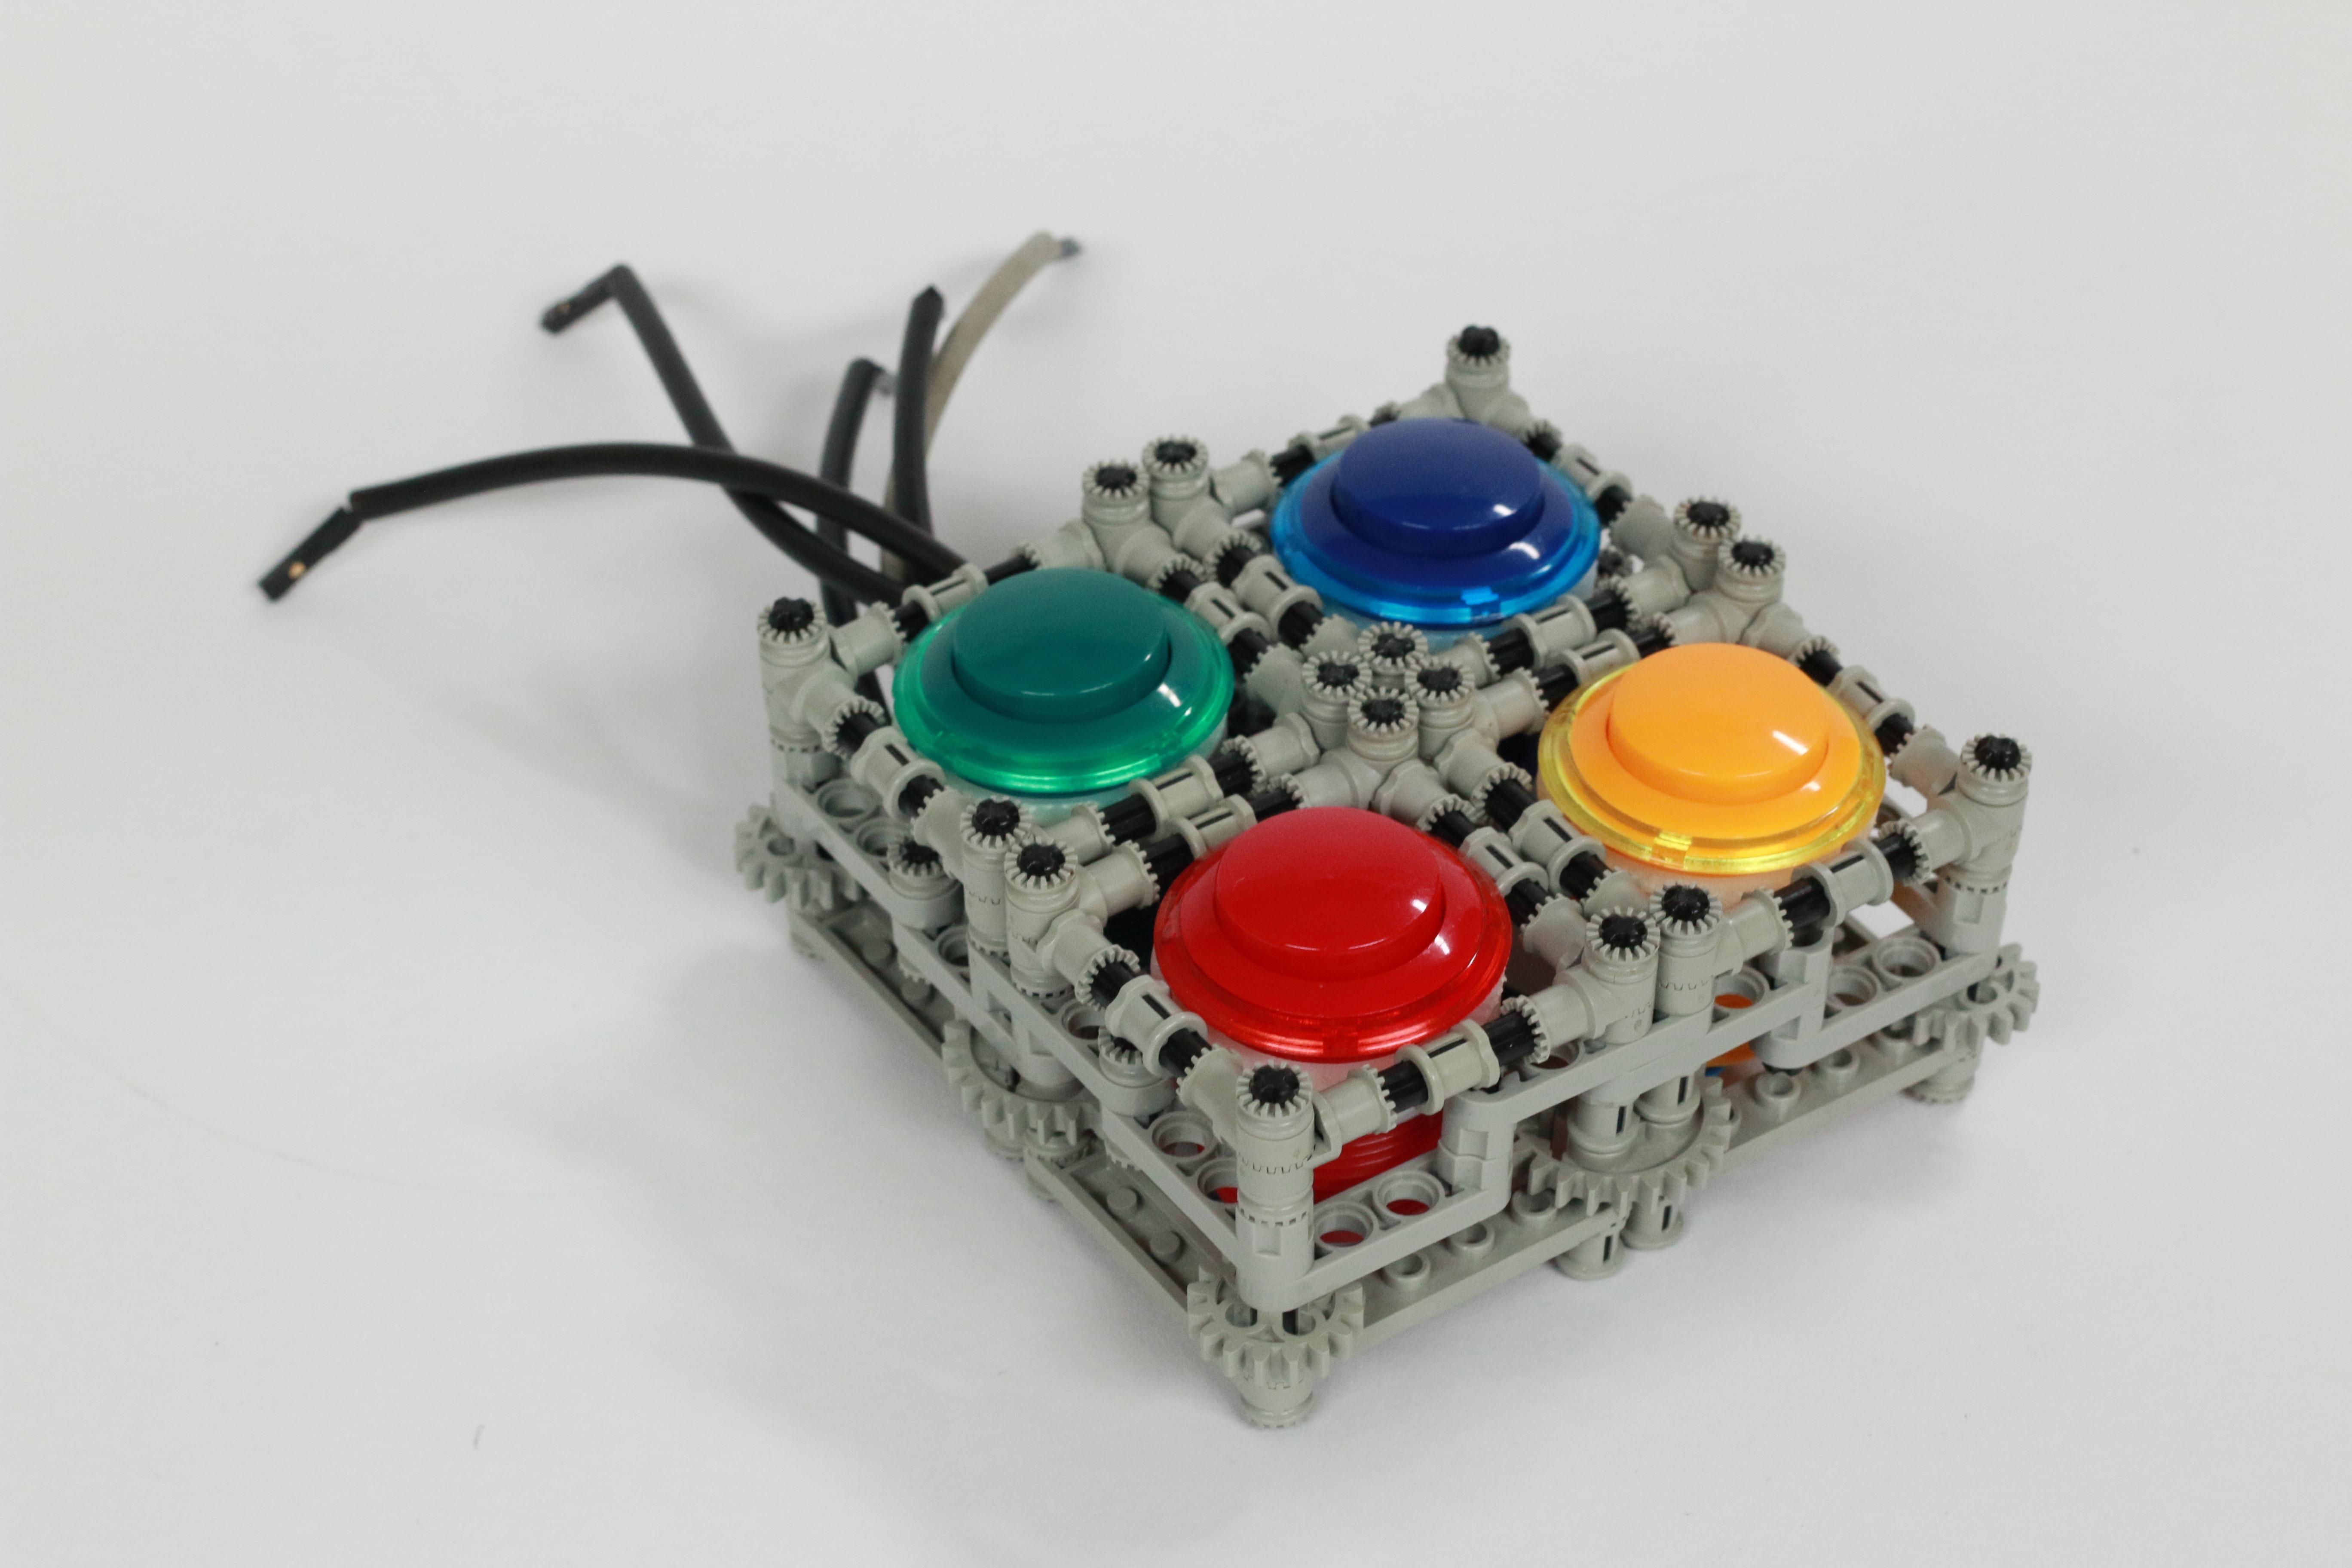 Der Lego Code Teil 3 Raspberry Pi Medienistik Blog Electronic Circuit Design Ideas Kommentar Verfassen